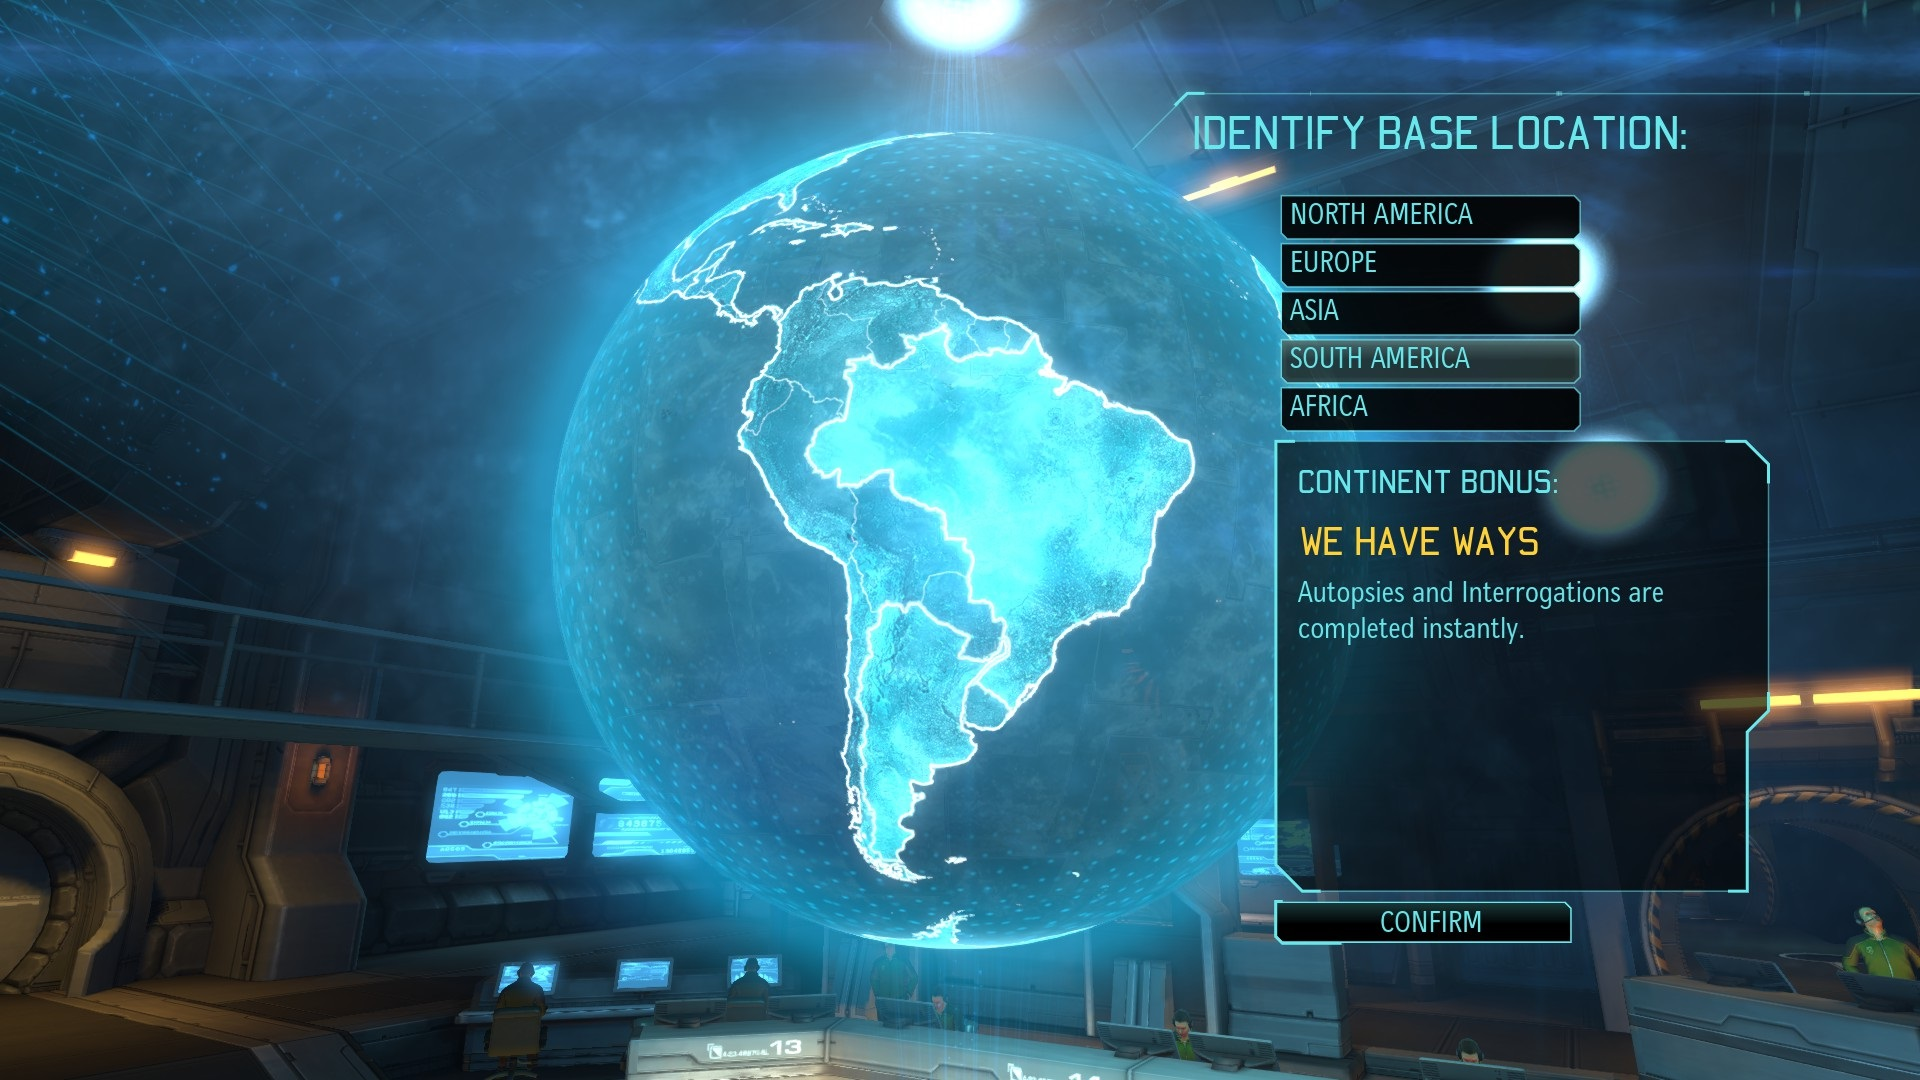 SouthAmericaBase.jpg